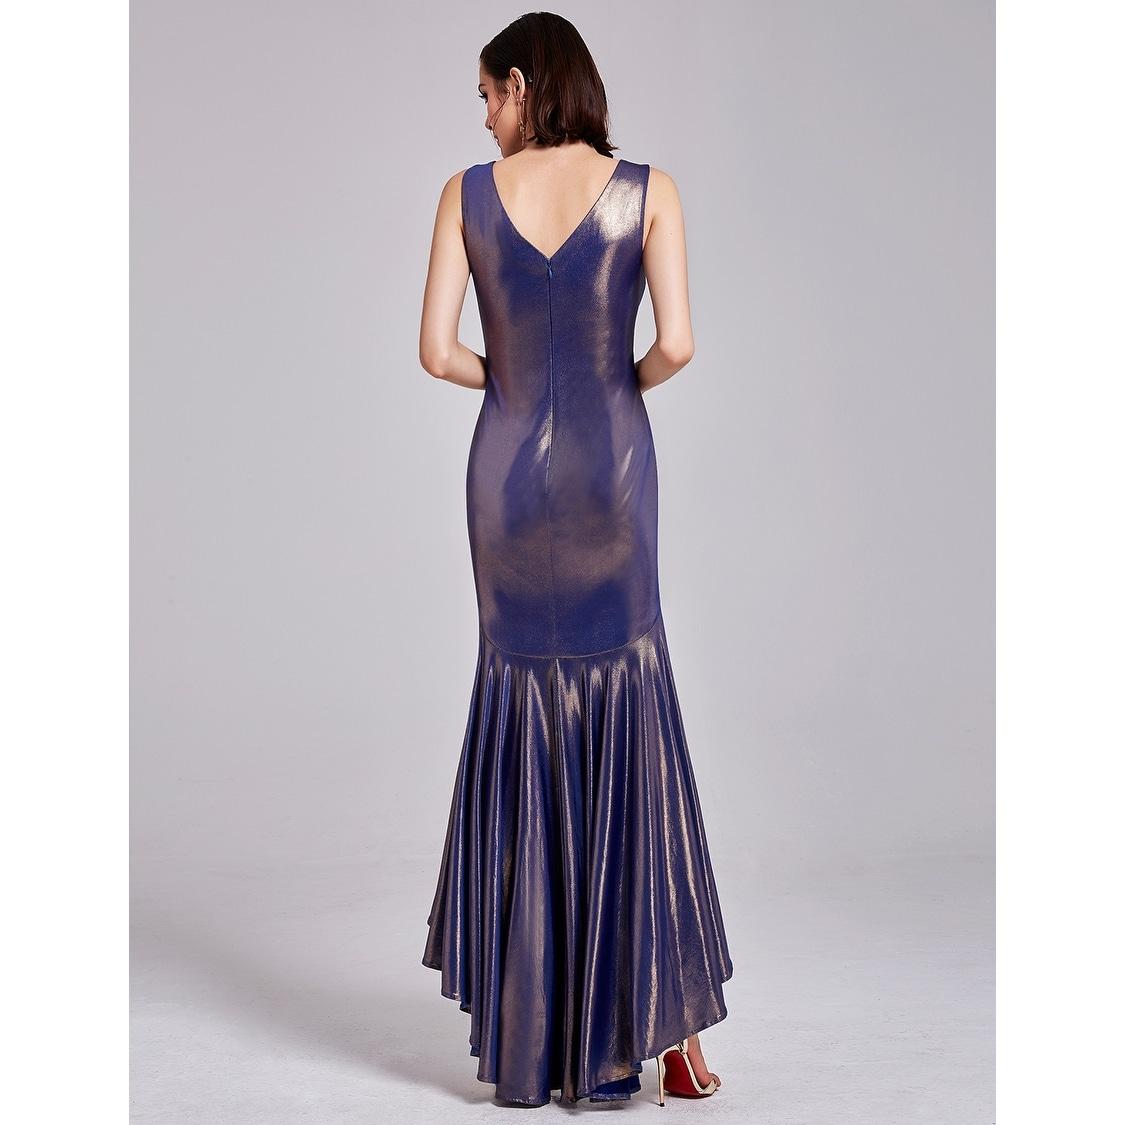 10b8d64edcd2 Ever-Pretty Christmas Women's V-neck Elegant Hi-Low Sleeveless Special  Occasion Dress 07207